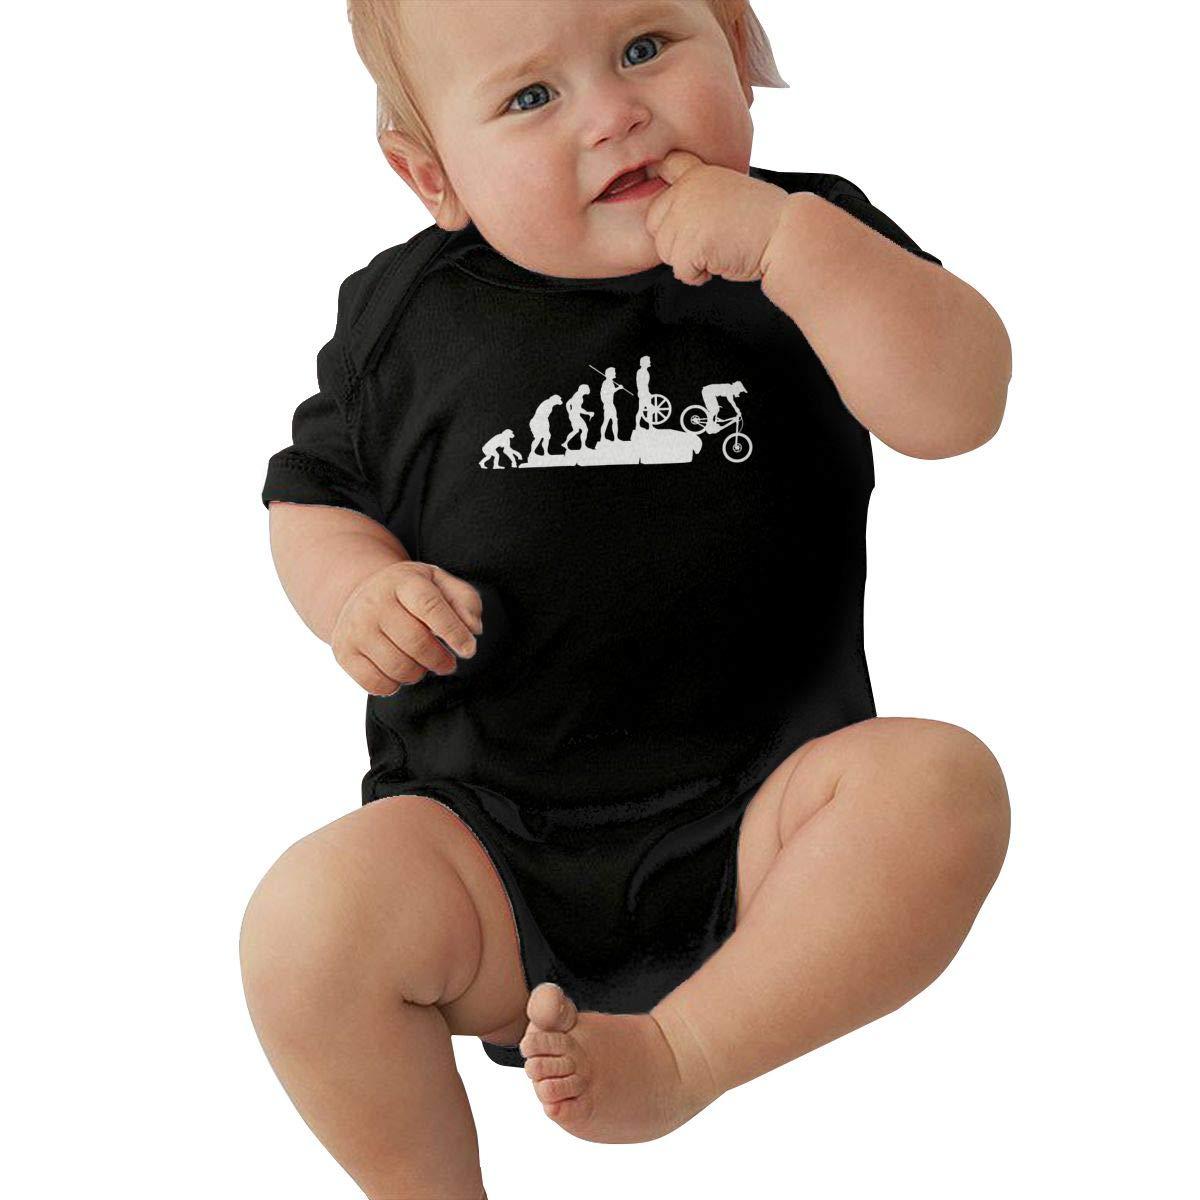 Mountain Bike Downhill Infant Baby Girl Boy Bodysuit Jumpsuit Short Sleeve Bodysuit Tops Clothes